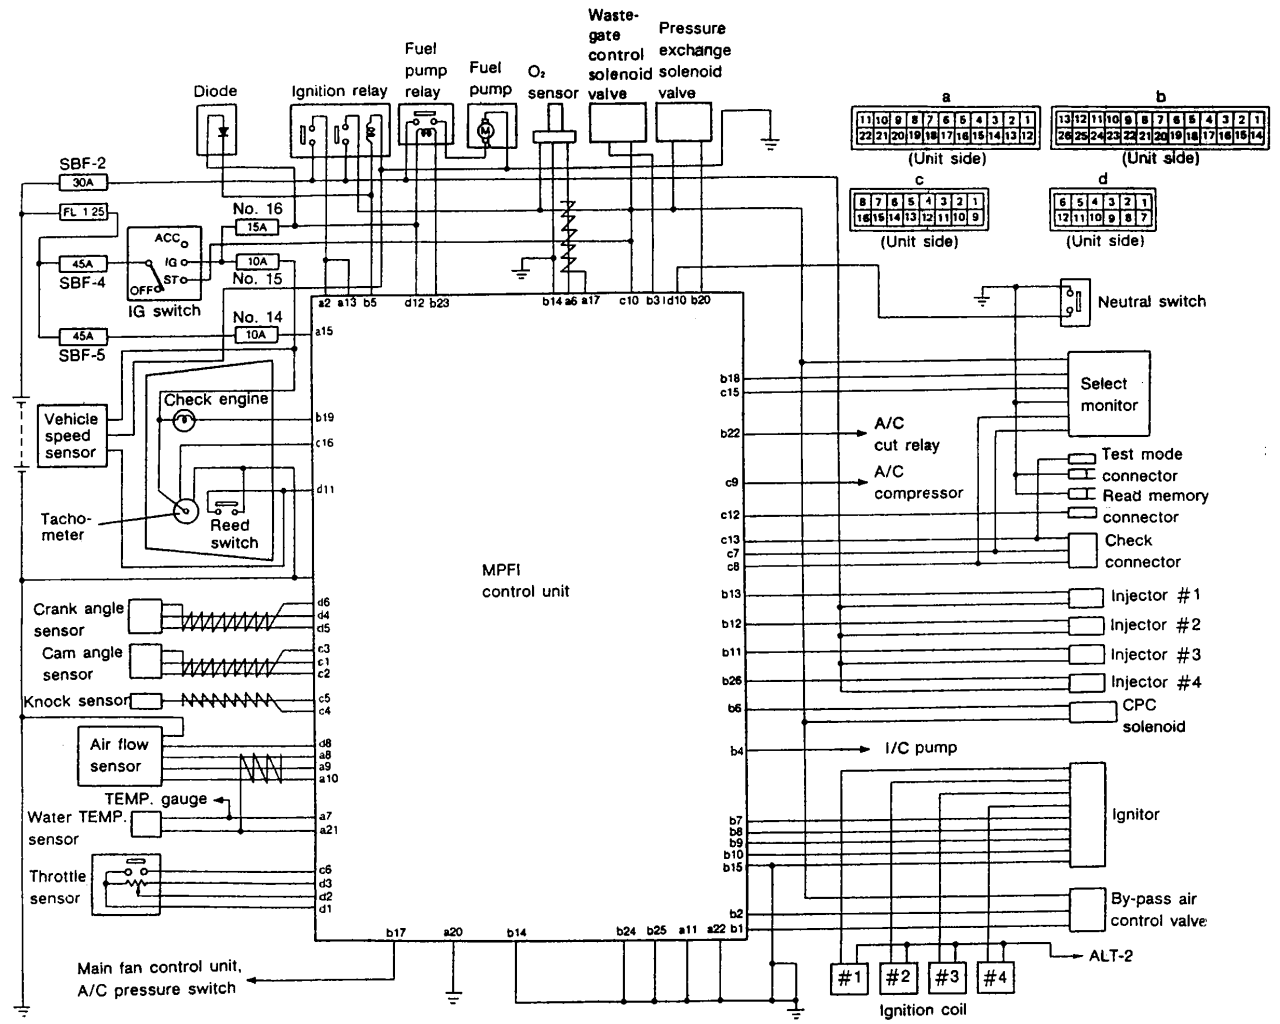 ON_9869] 92 Subaru Legacy Wiring Diagram Wiring Diagram